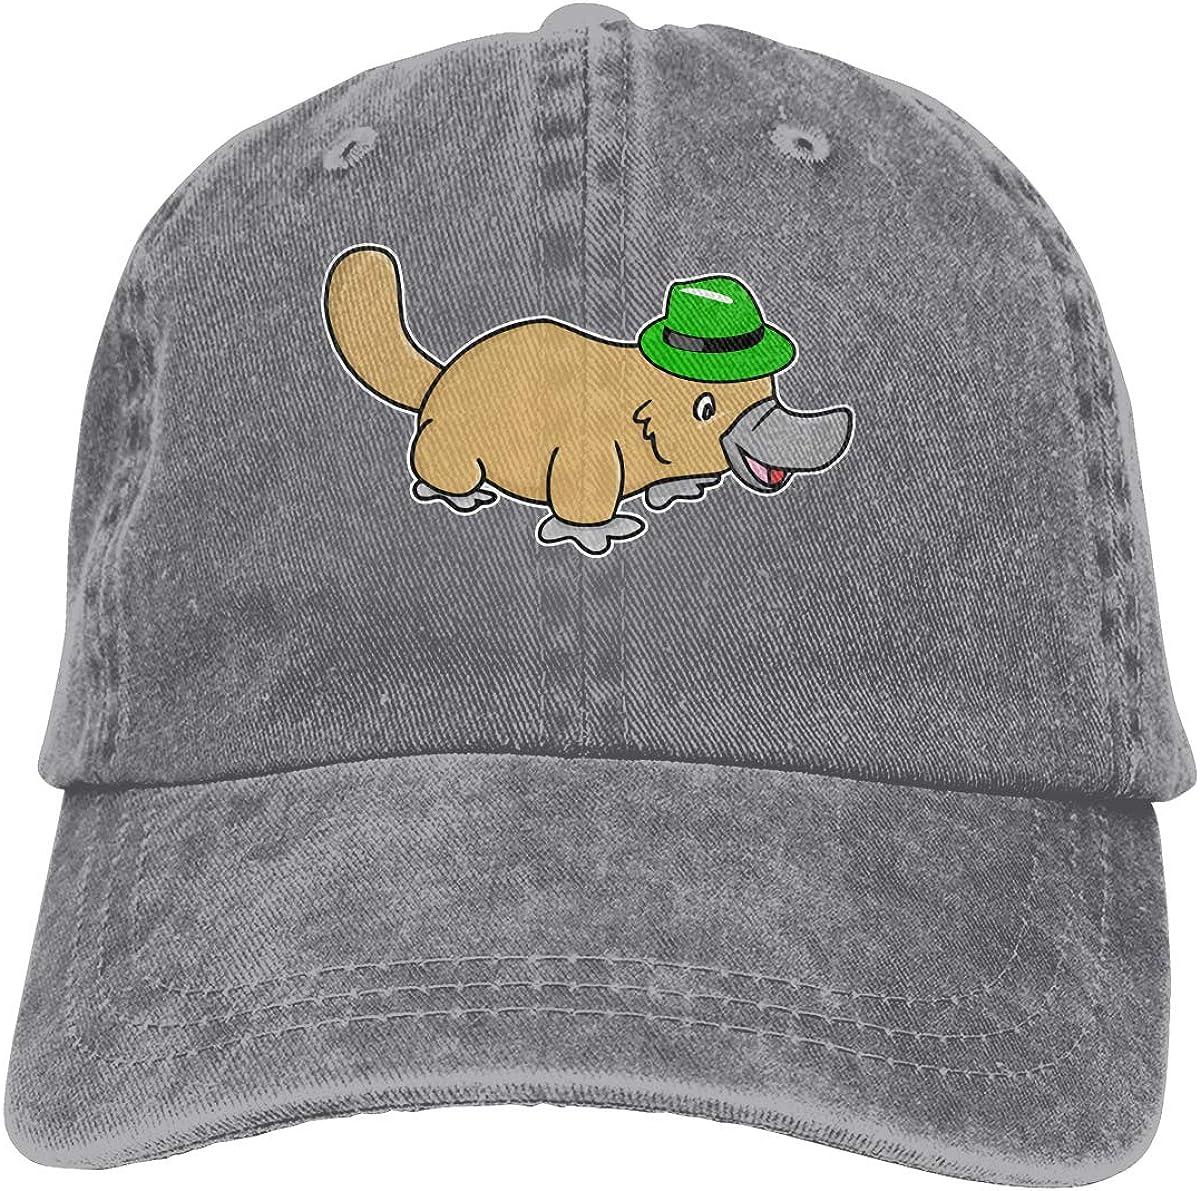 Unisex Cute Platypus Vintage Washed Dad Hat Funny Adjustable Baseball Cap